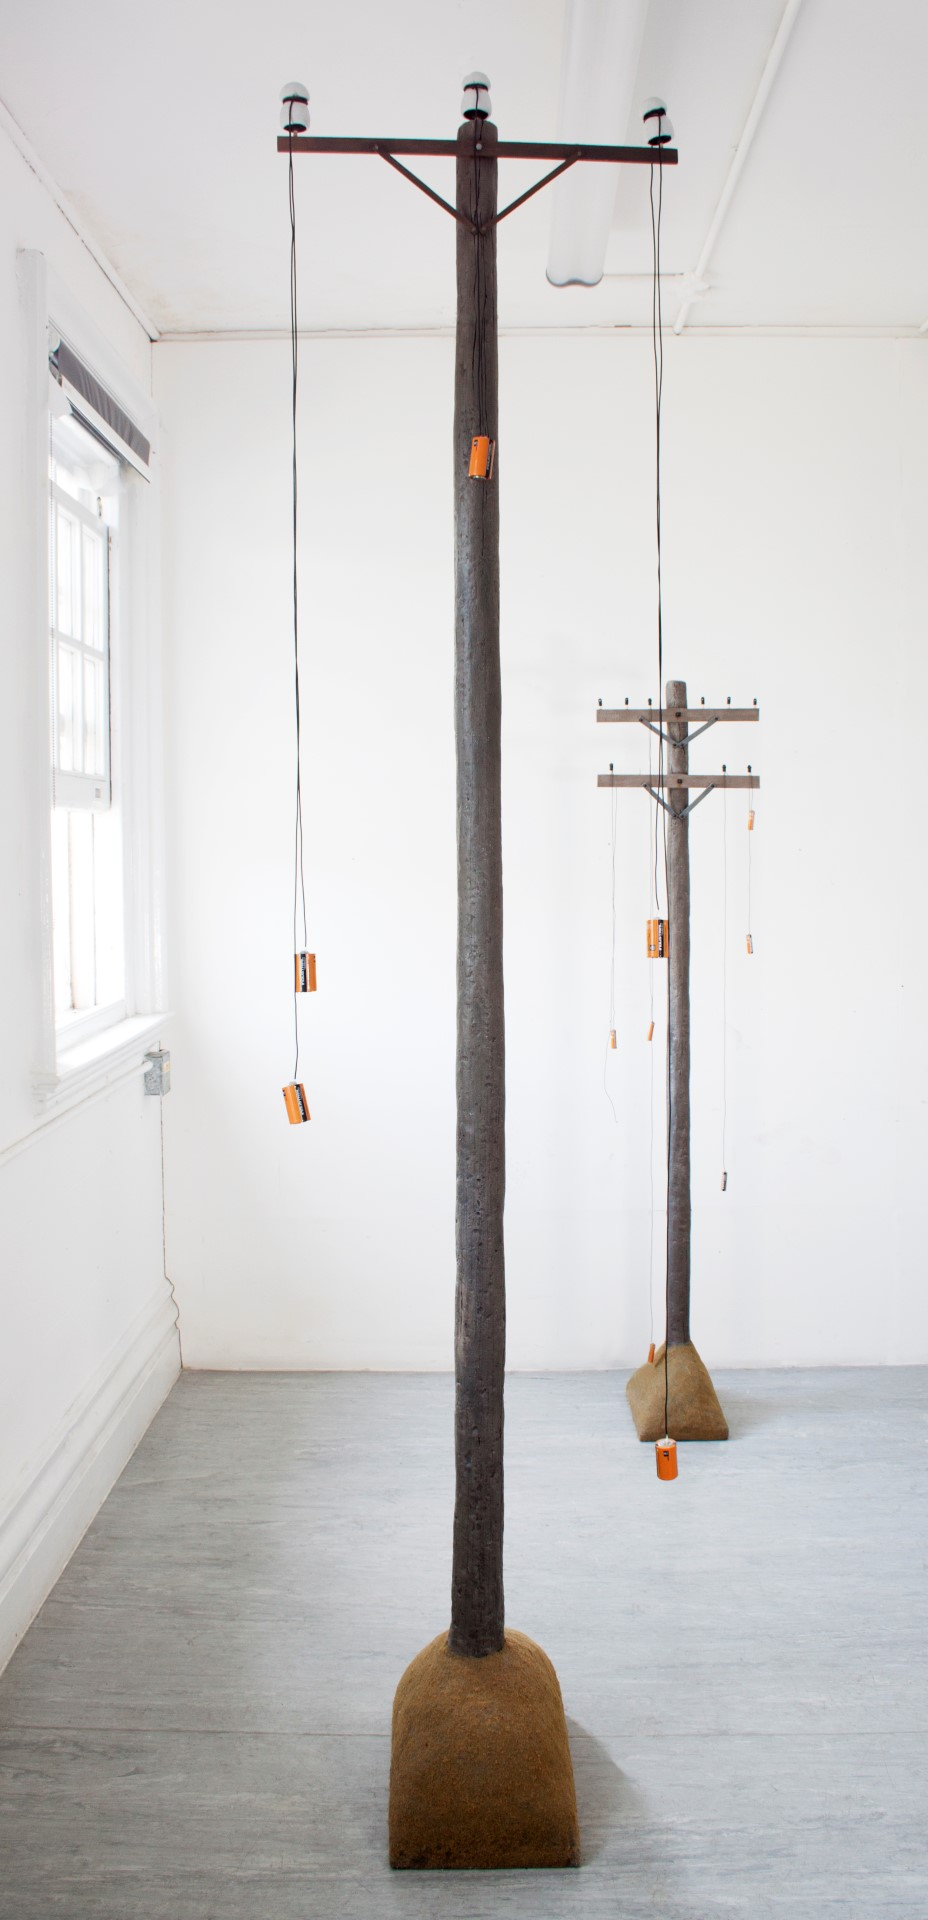 Simon Handy handiwork - a robot telegraph pole